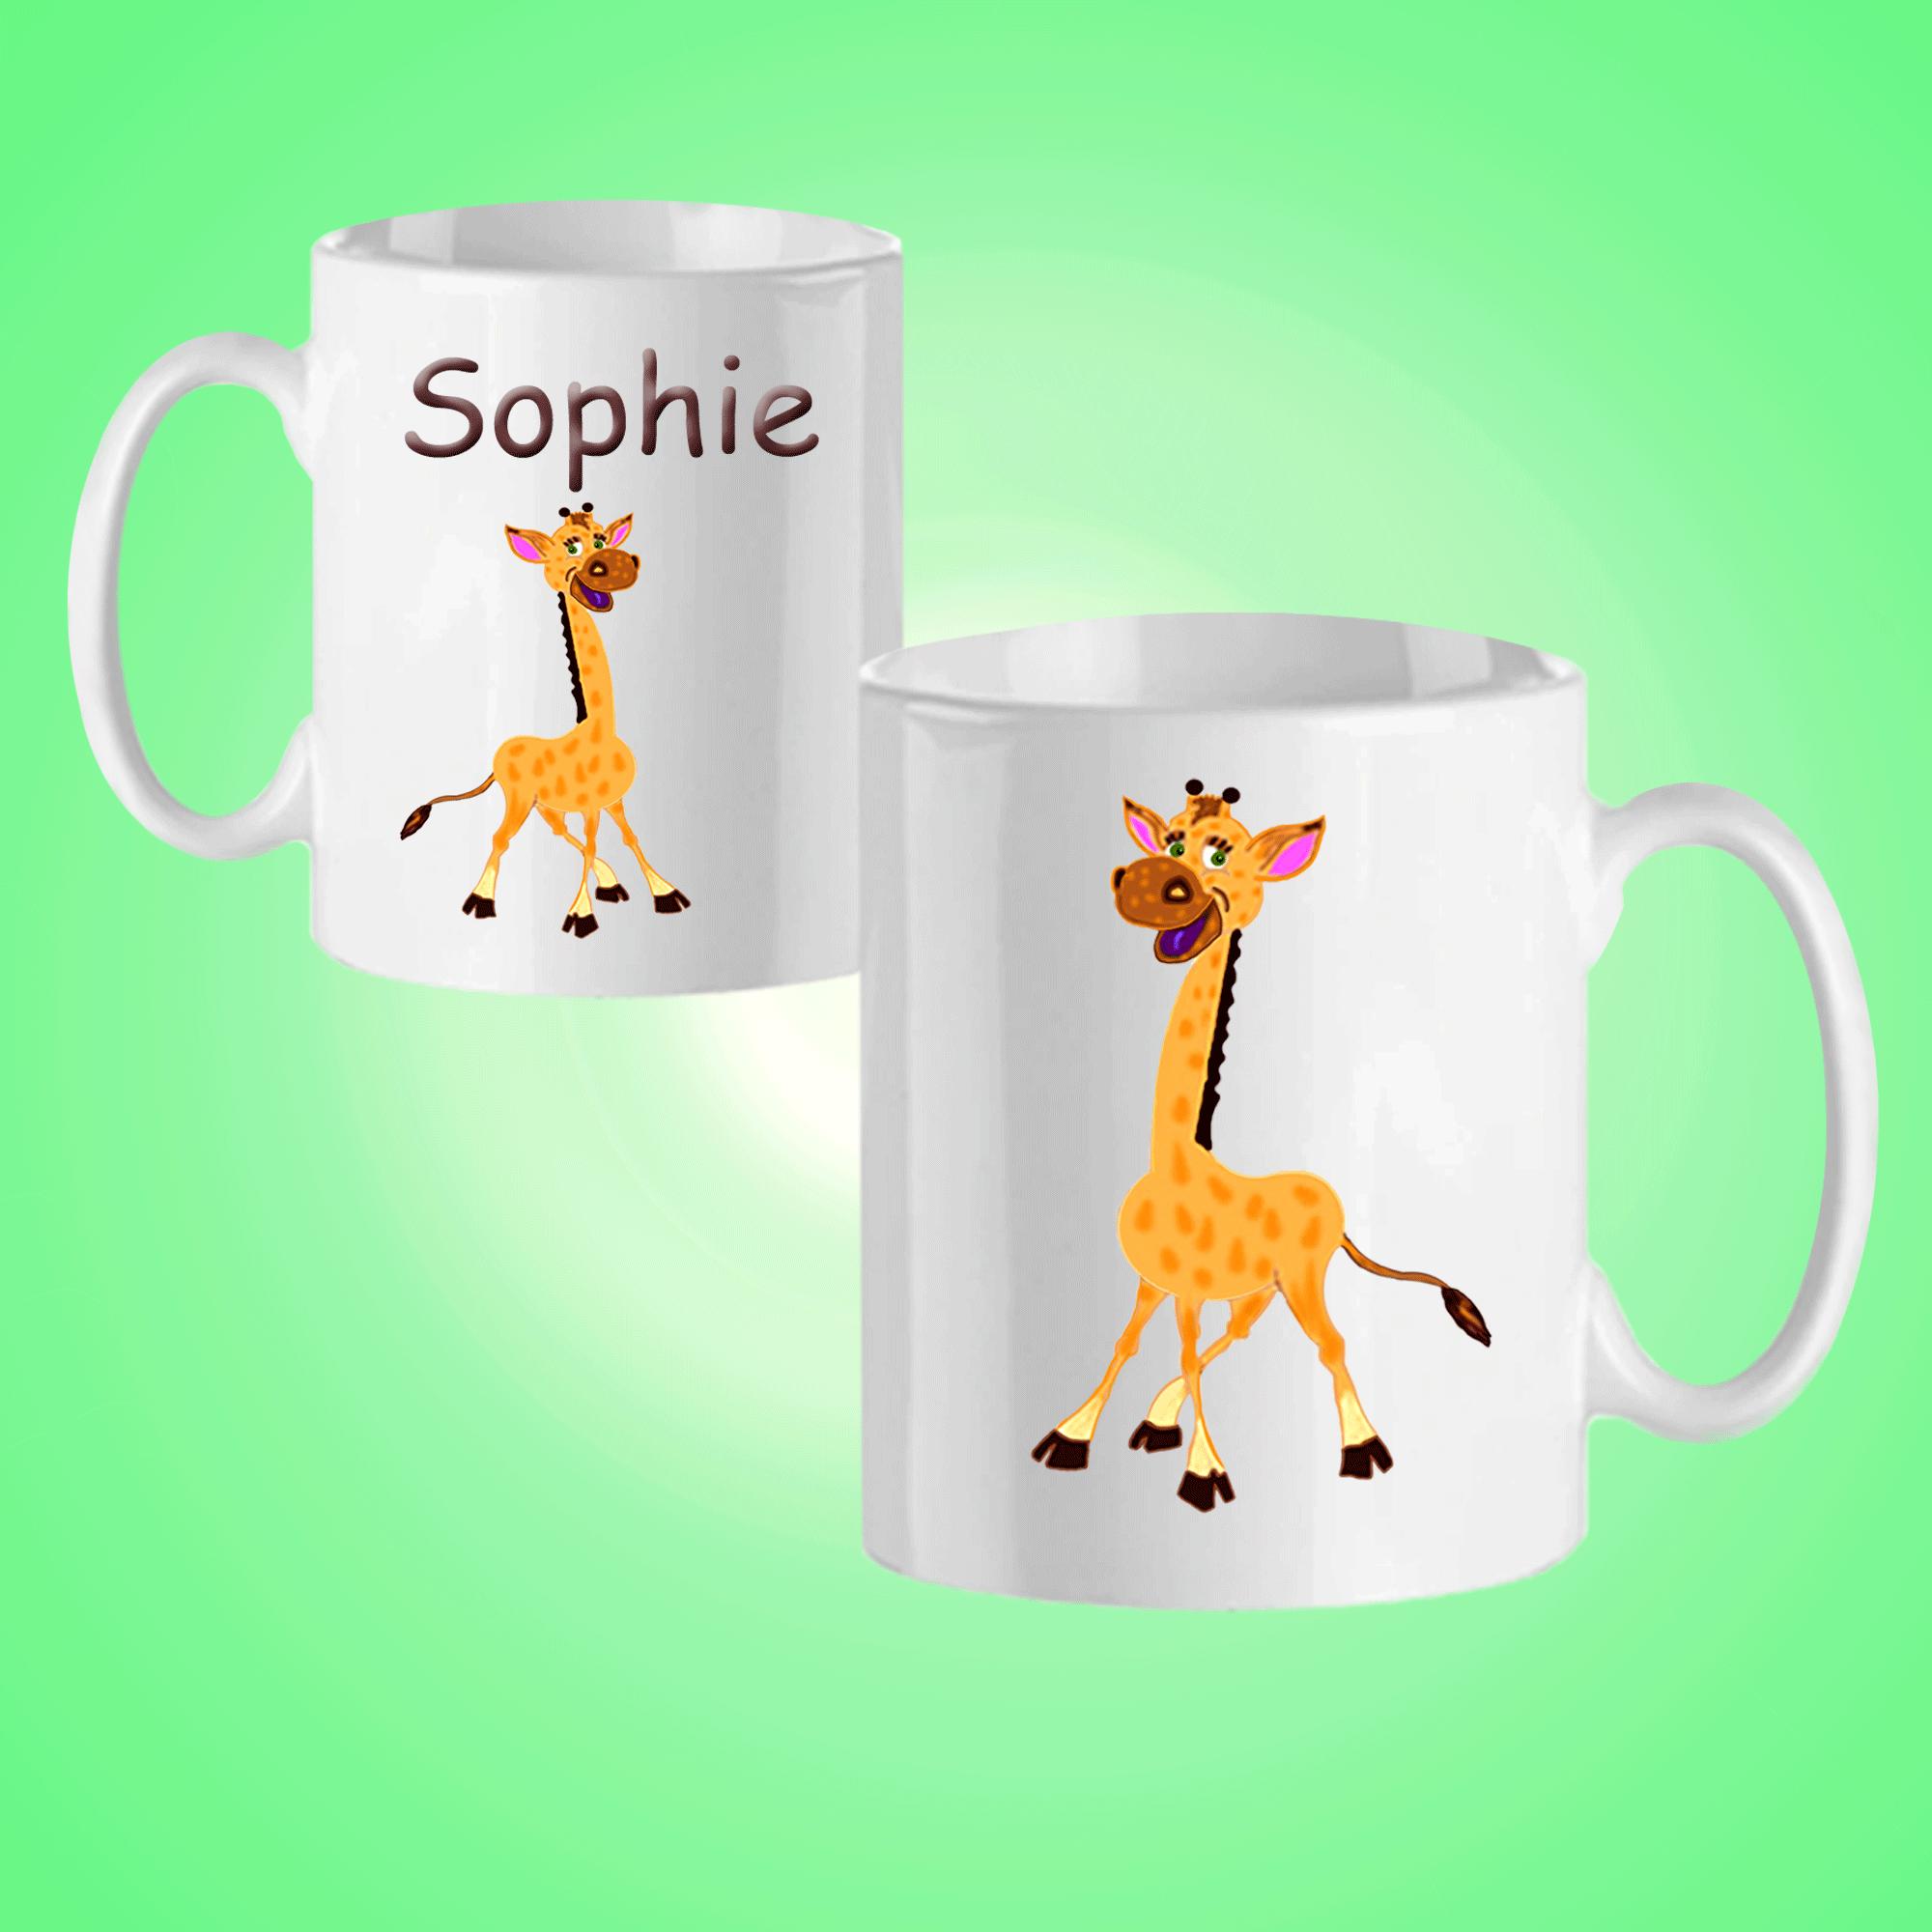 mug-girafe-prenom-personnalisable-personnalisation-personnalise-blanc-ceramique-tasse-savane-afrique-animal-mammifere-sophie